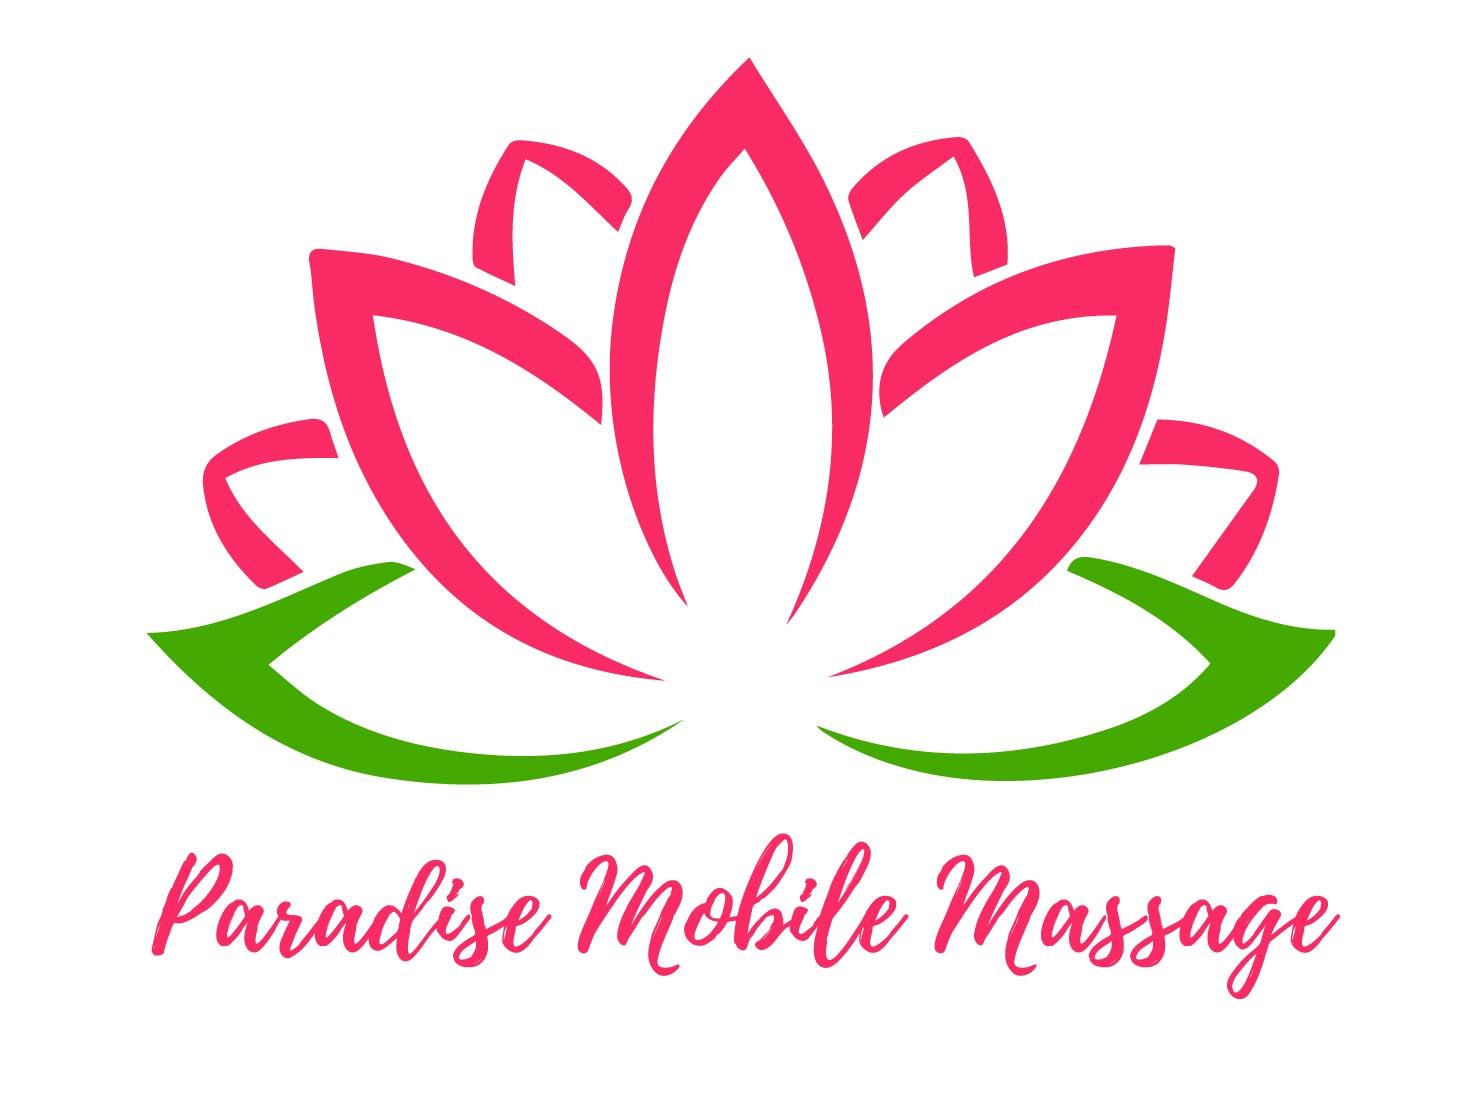 Paradise Mobile Massage St. George, Utah - Utah's Best Vacation Rentals